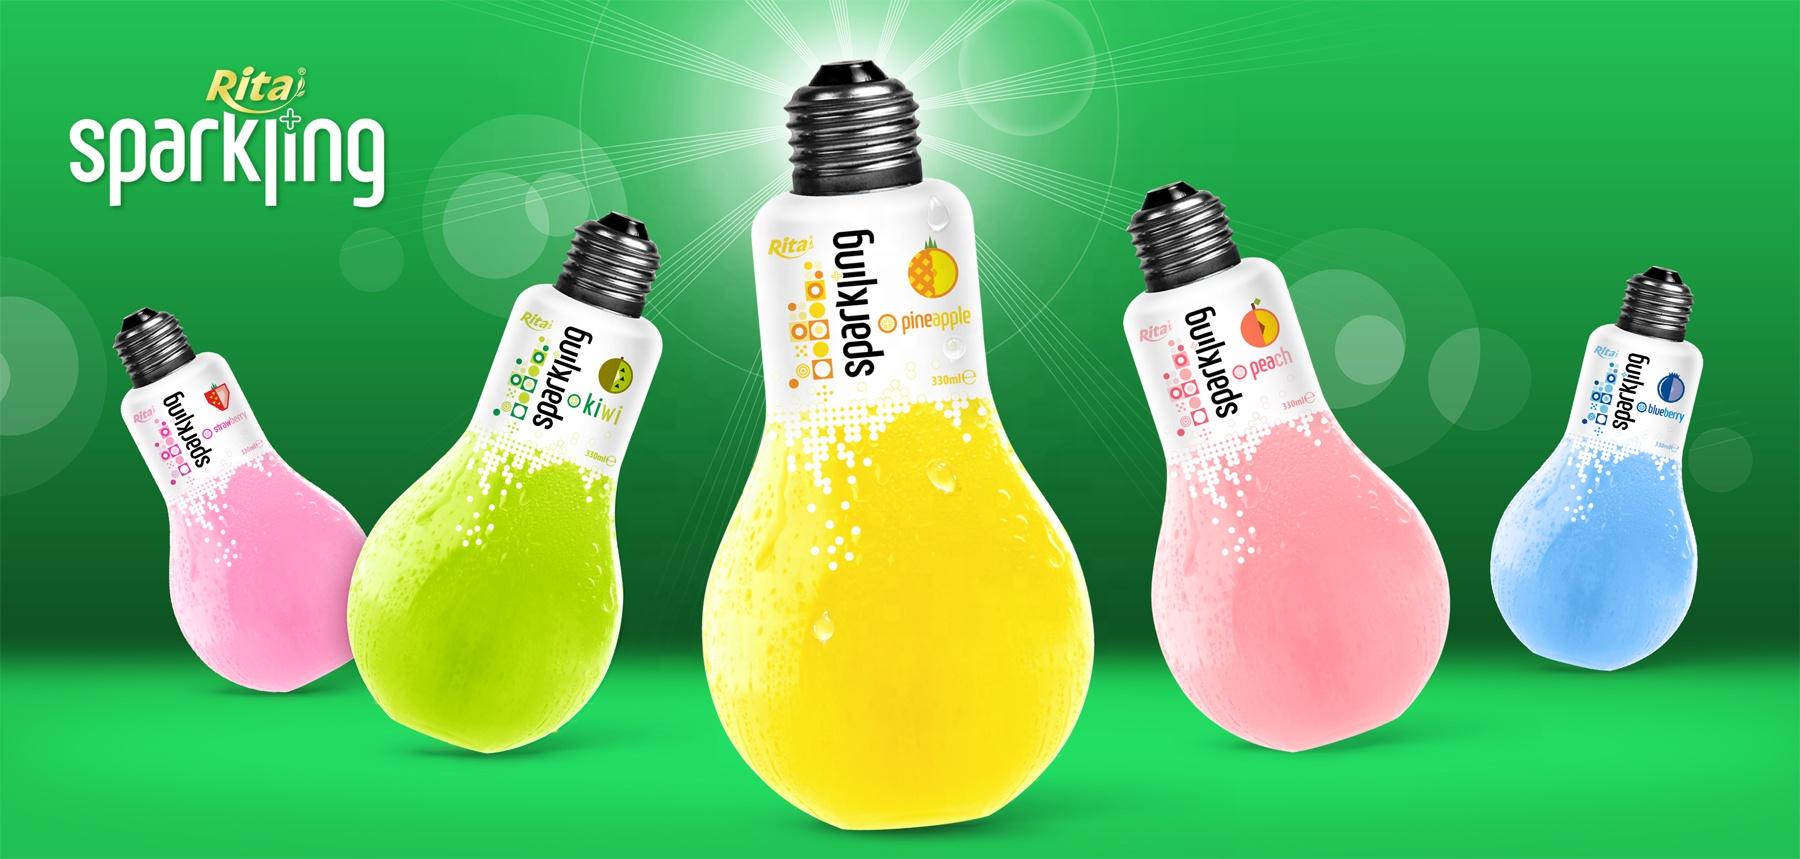 Vietnam High Quality Beverage 330ml Pet Bottle Peach Flavor Carbonated Drink